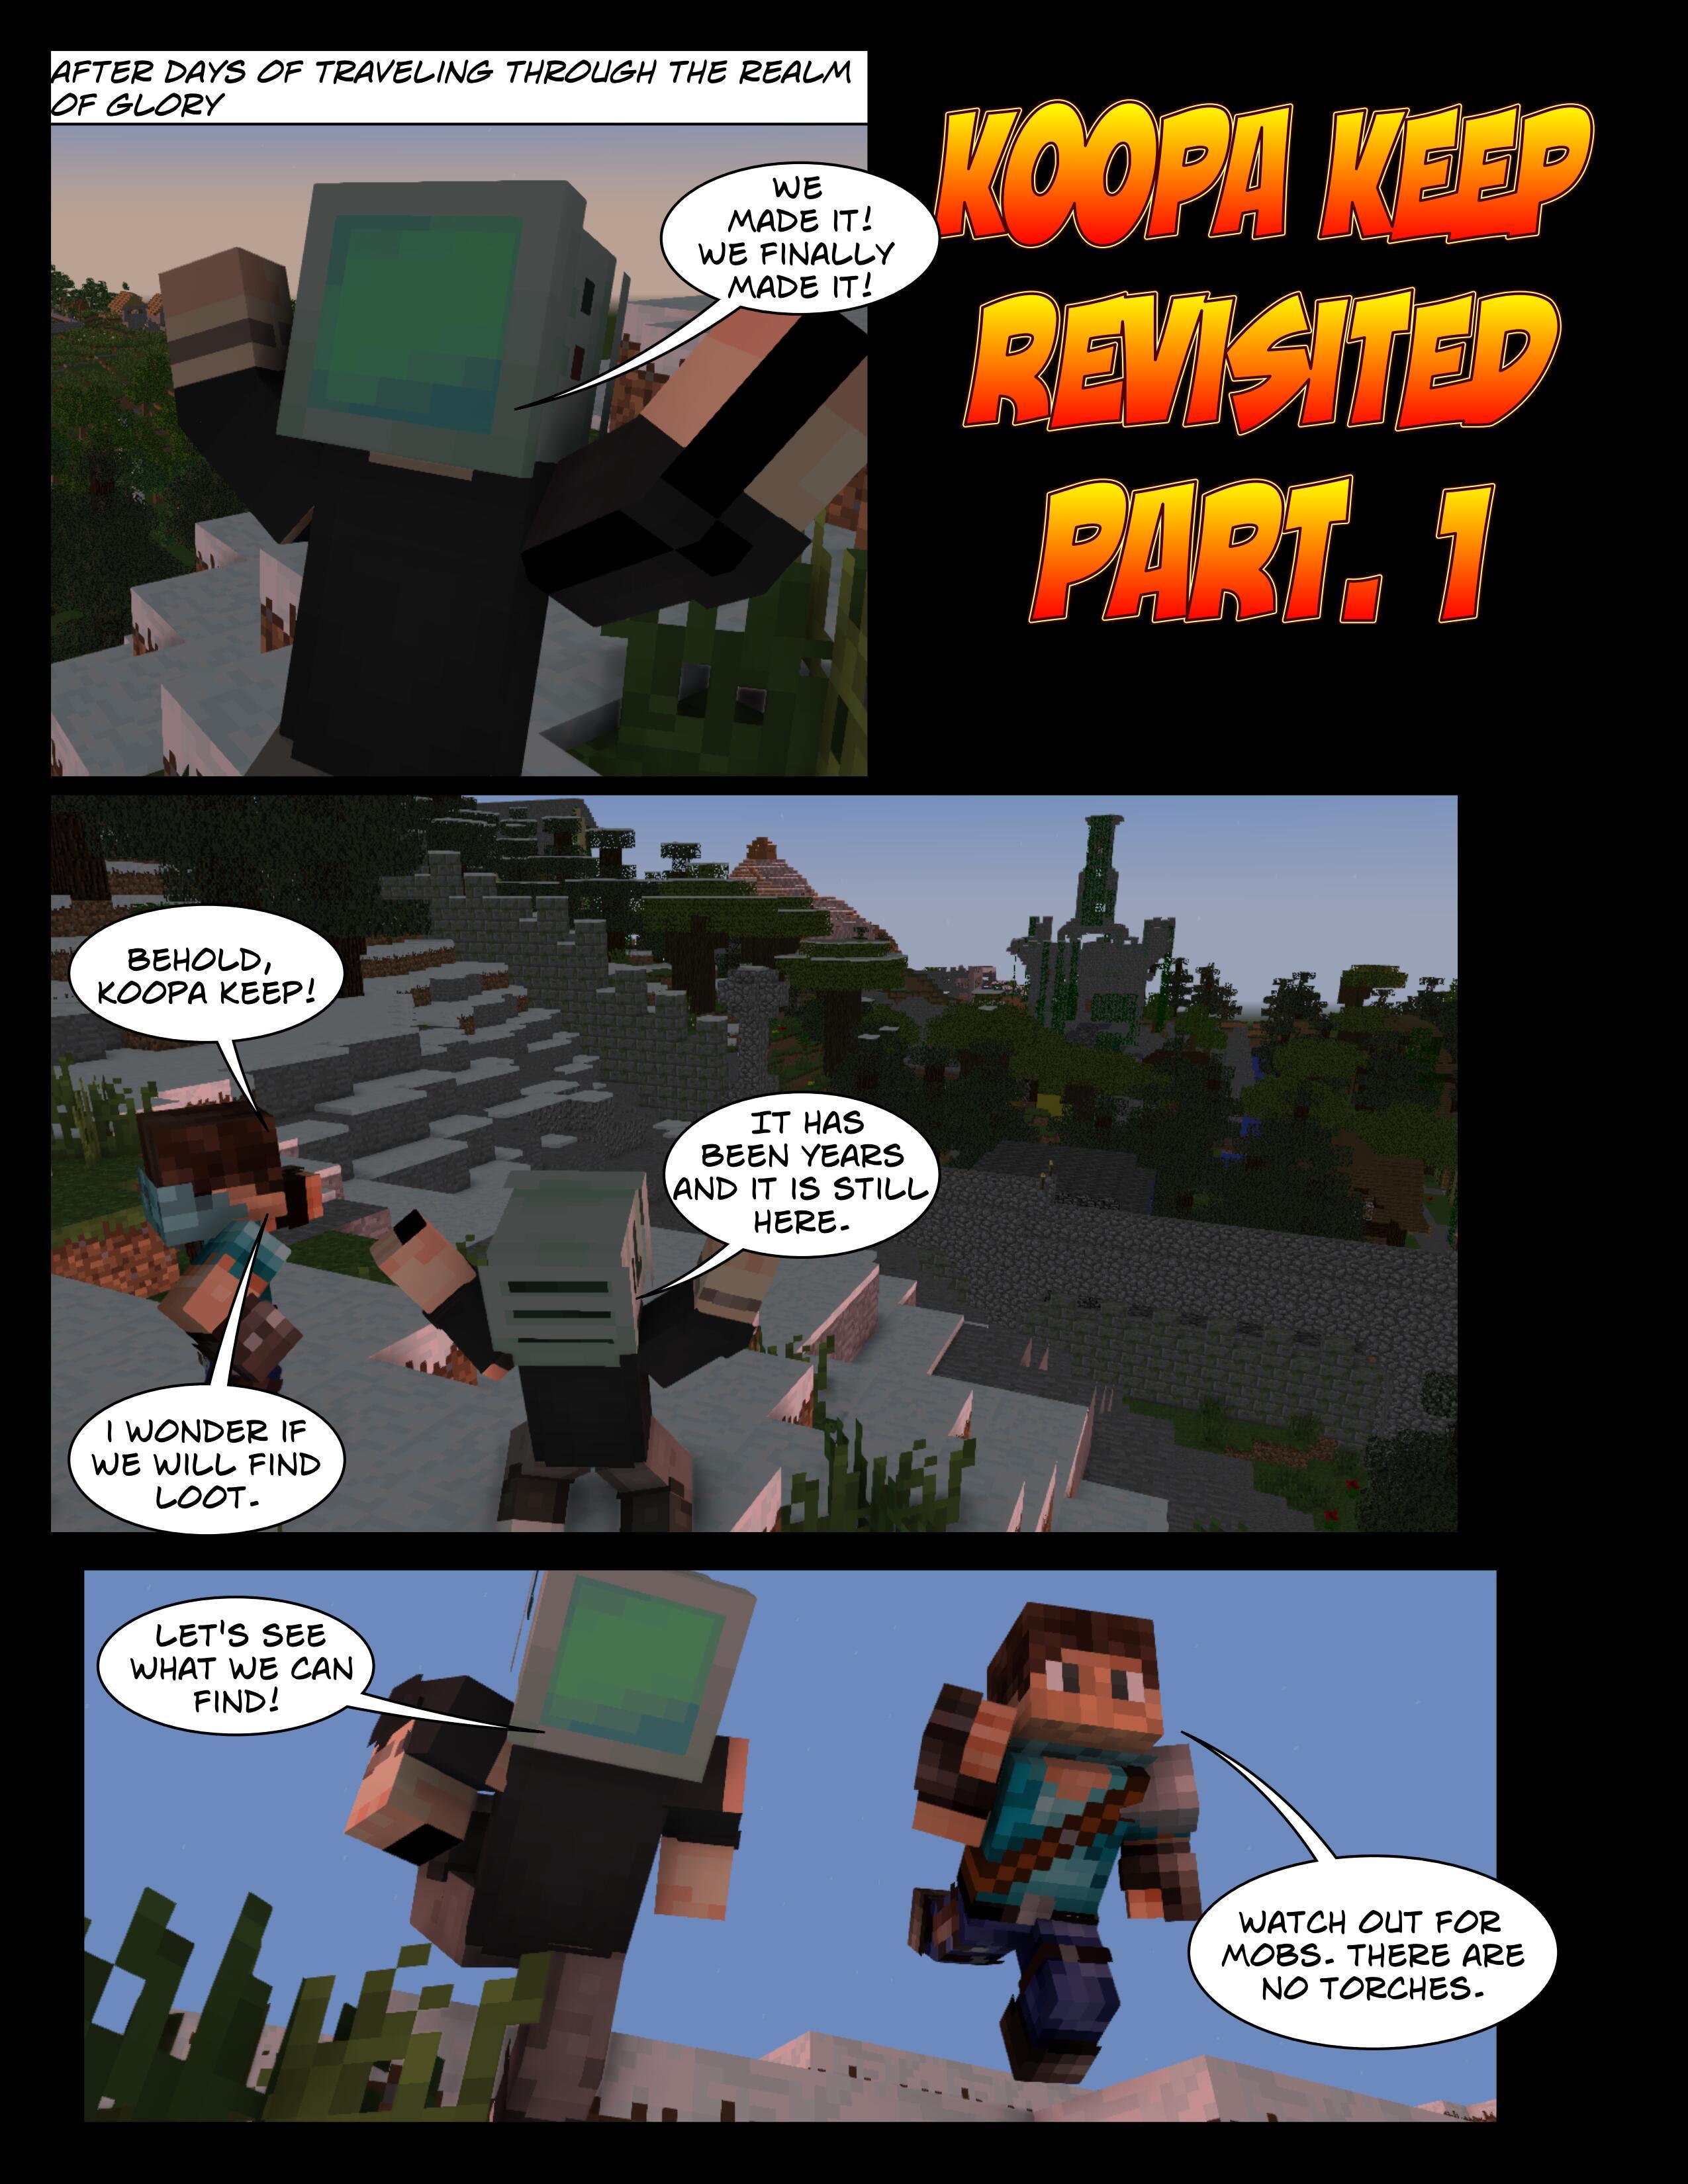 Koopa Keep Revisited Comic pg.1